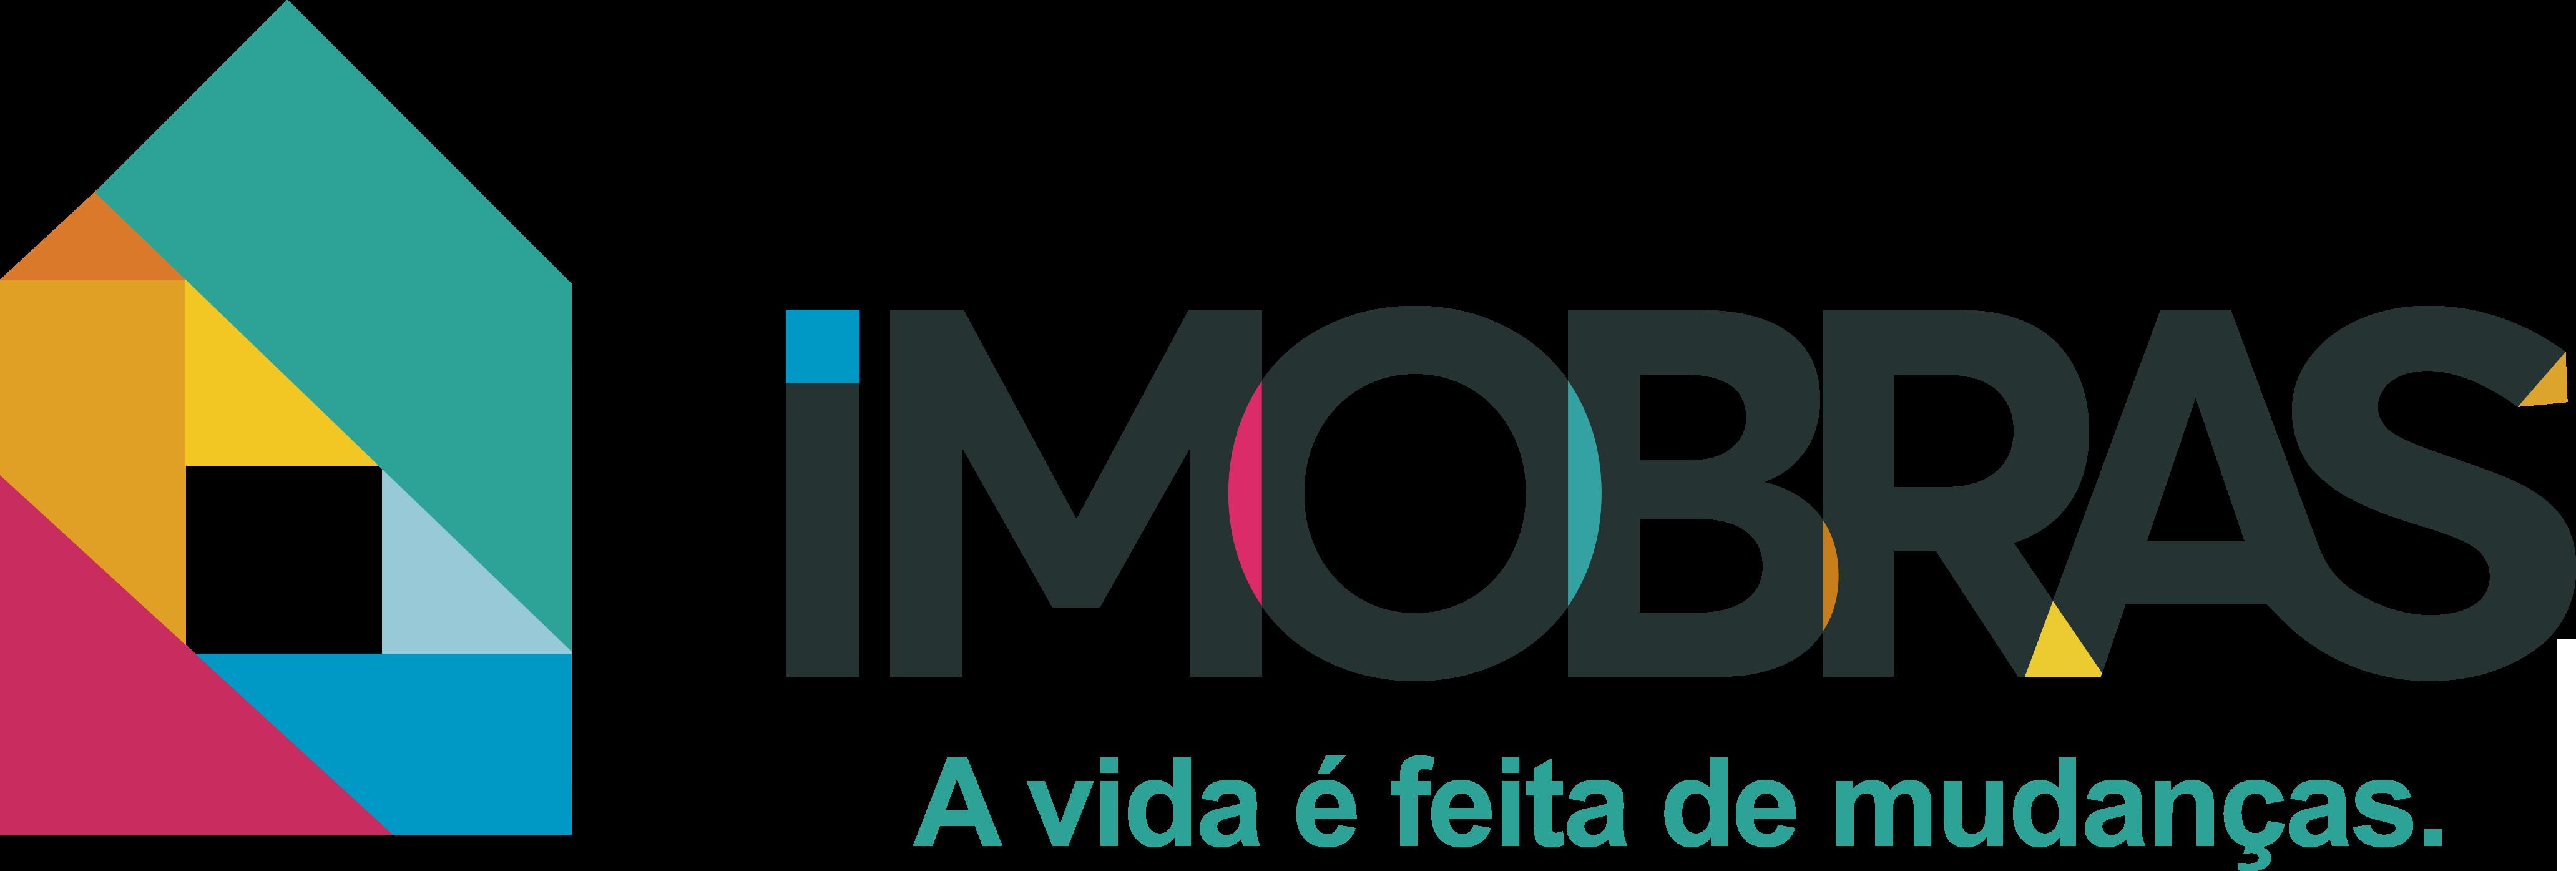 Imobras